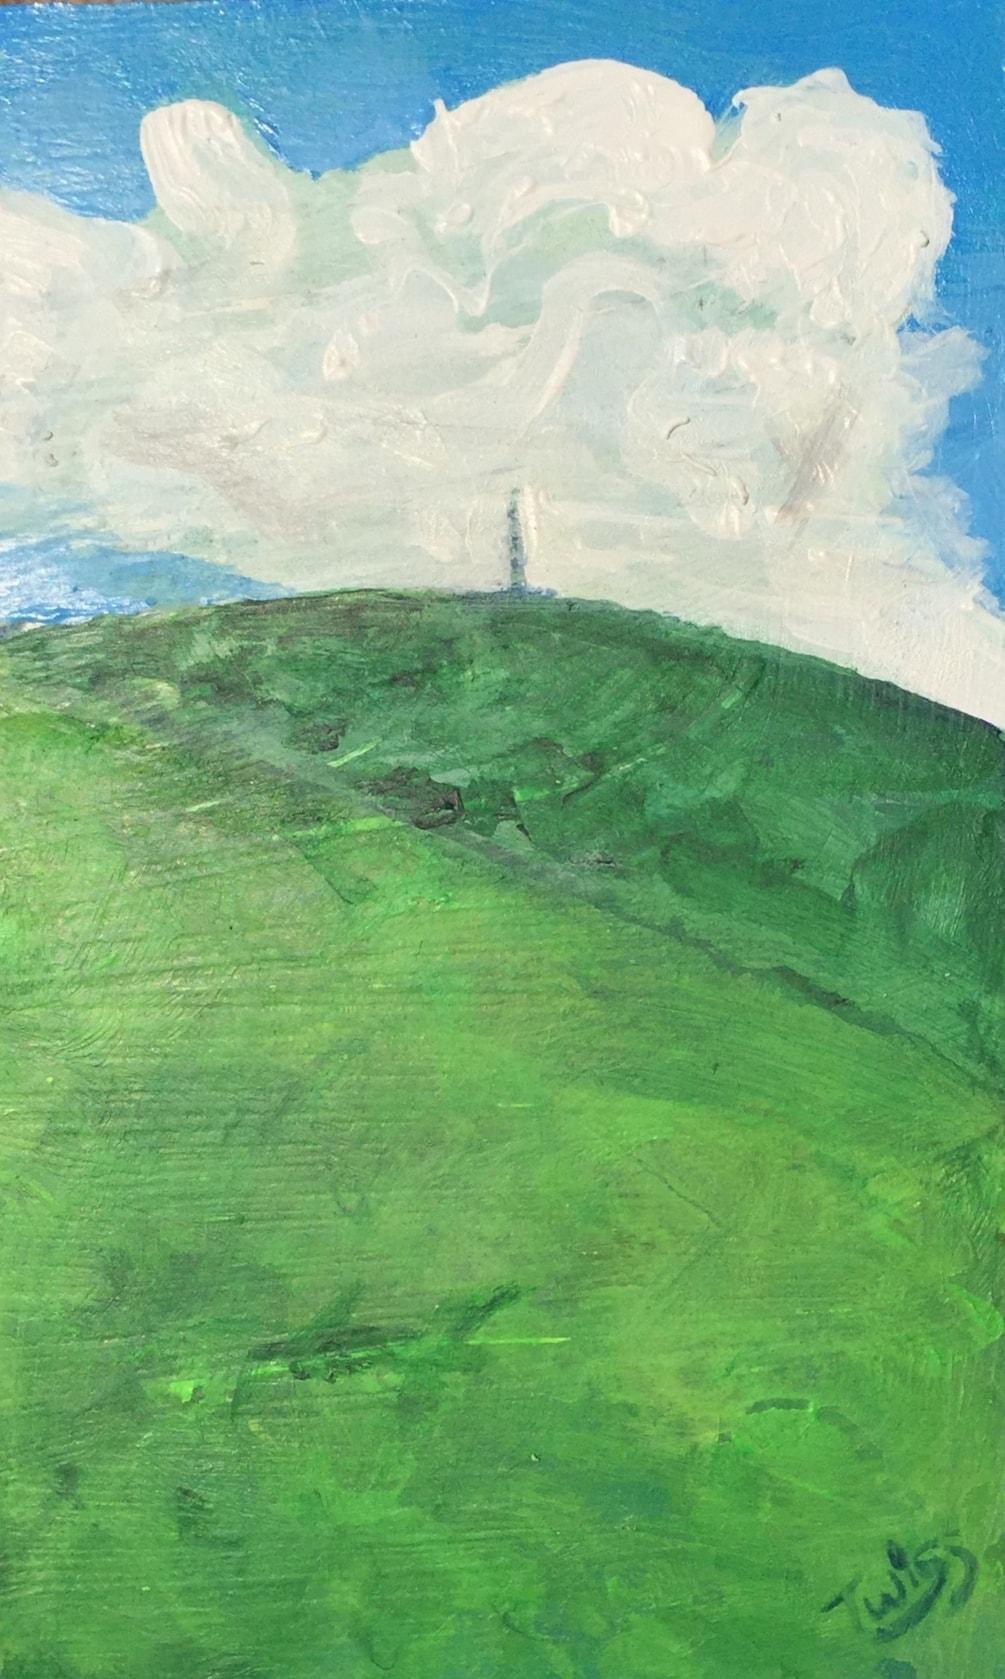 Sutton Common BT mast Croker Hill from the Morridge